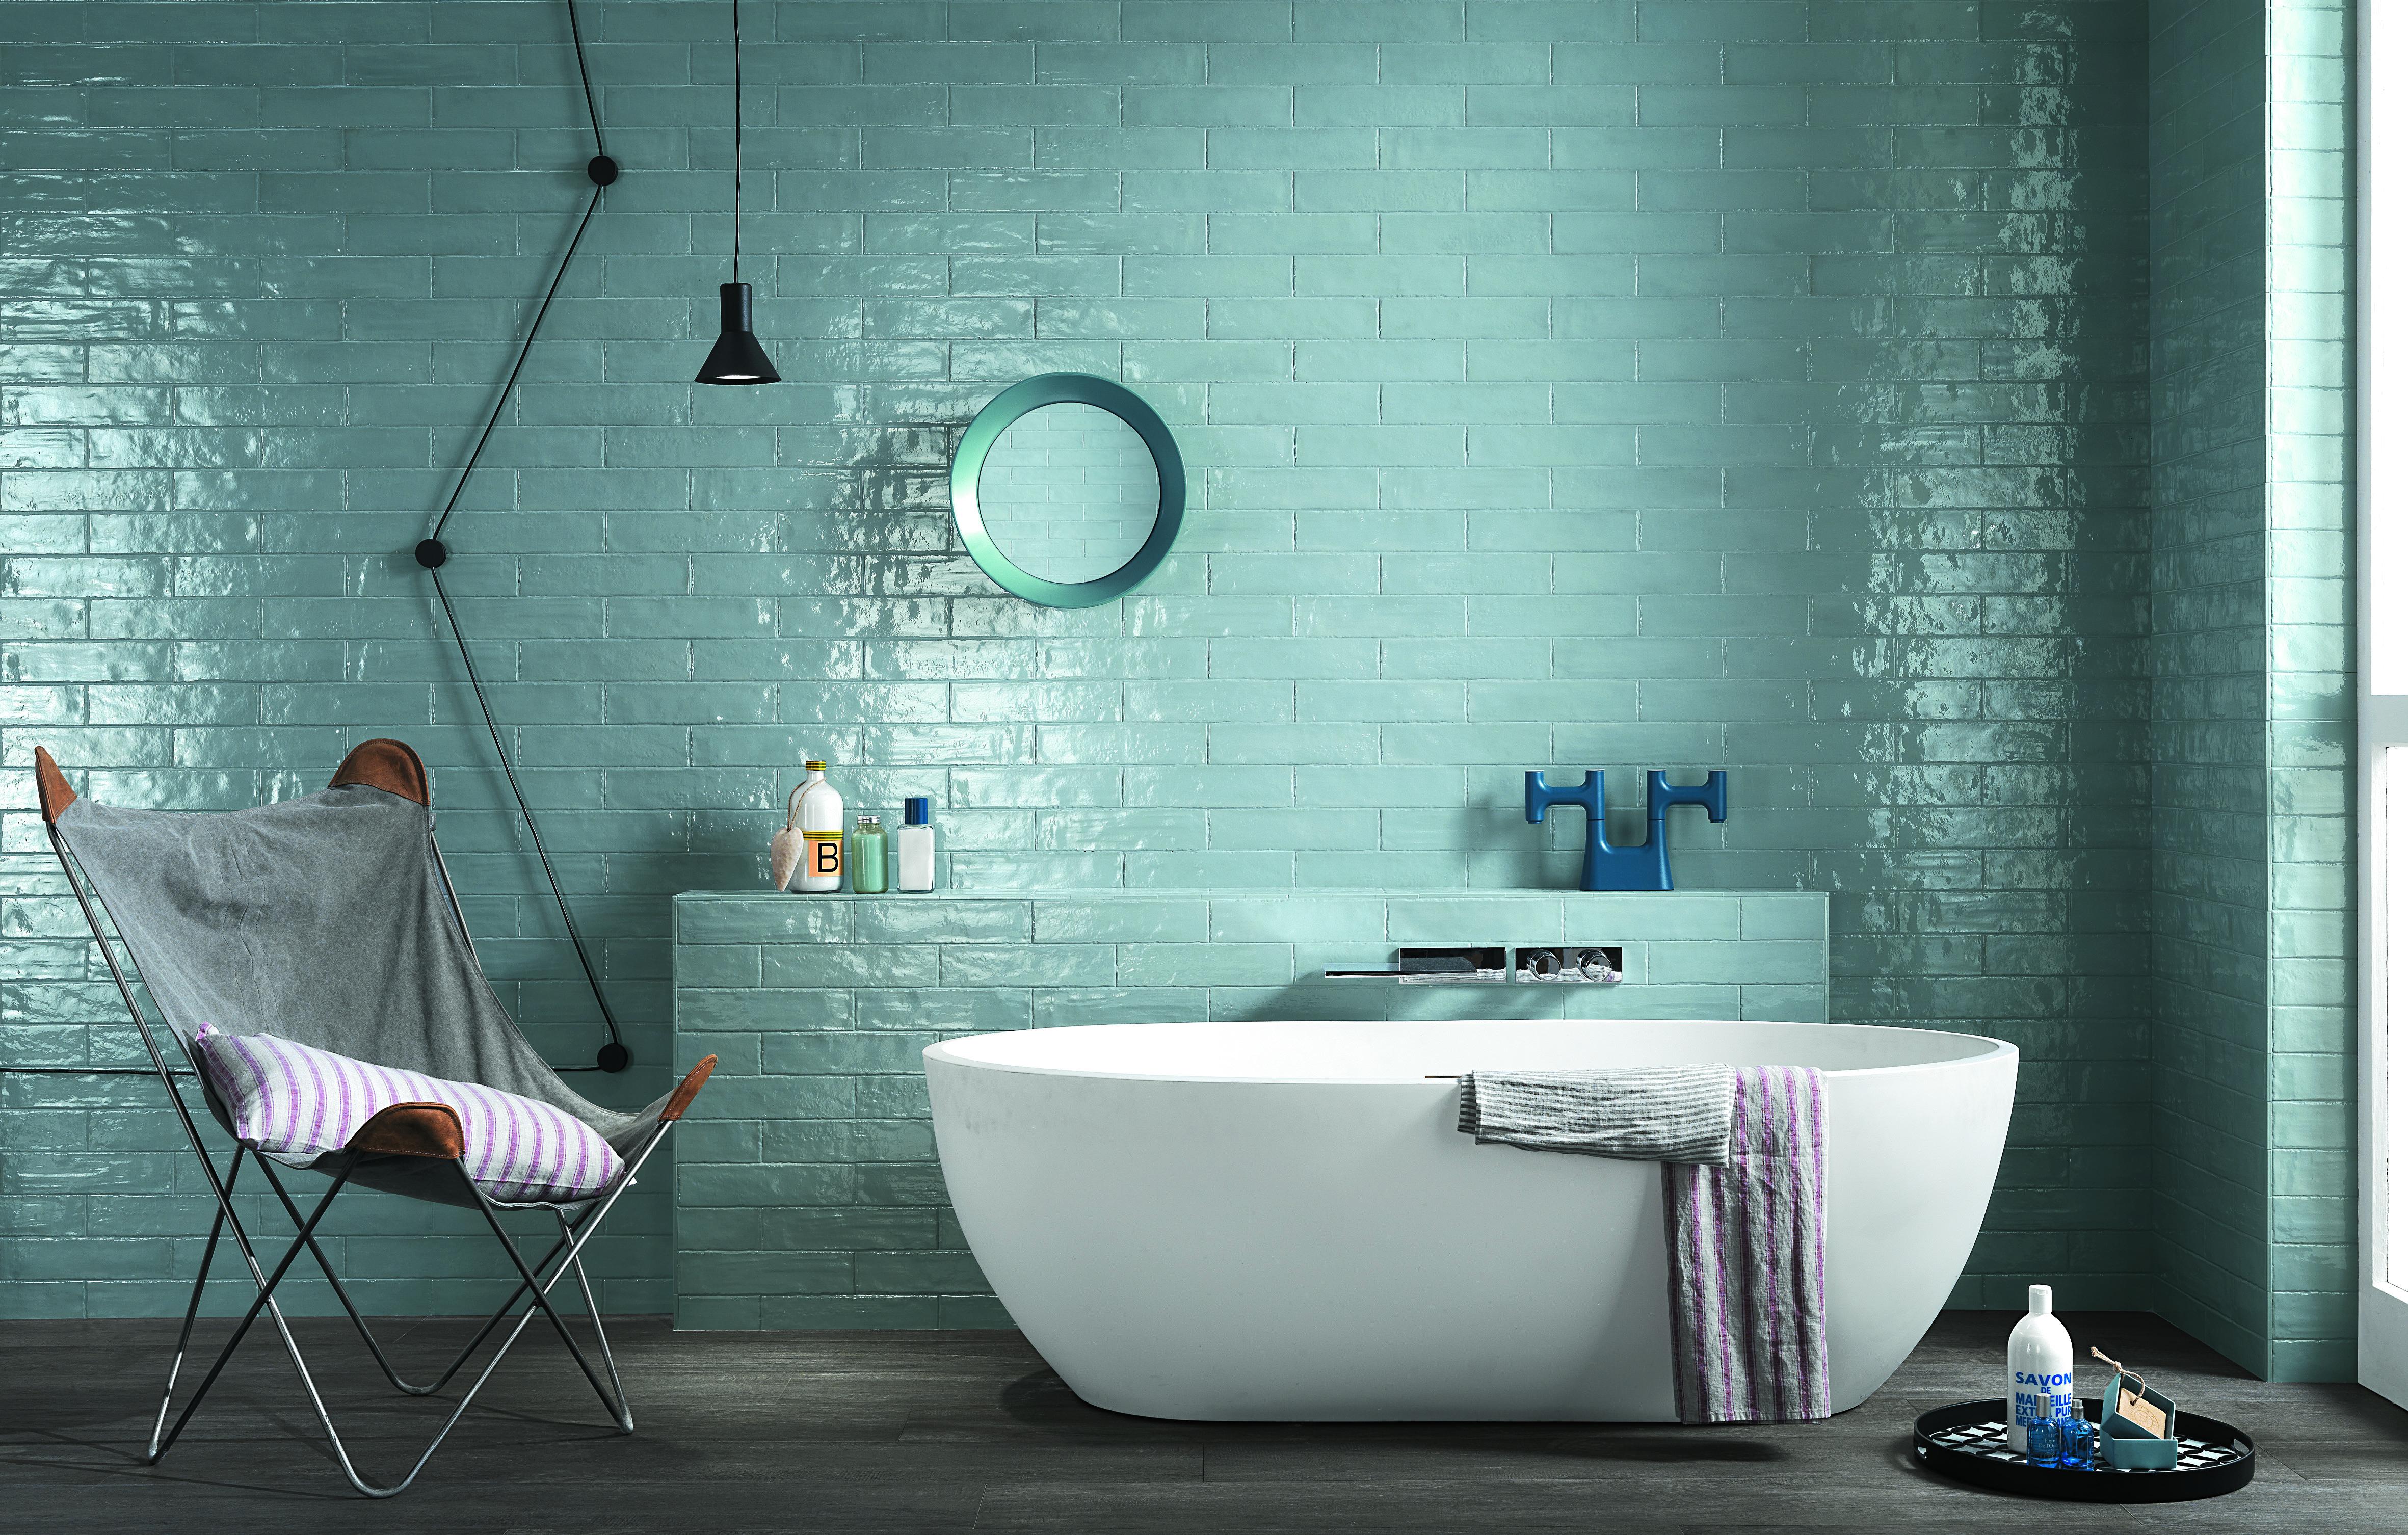 Une Salle De Bain Carreler ~ 5 id es originales pour carreler la salle de bains styles de bain